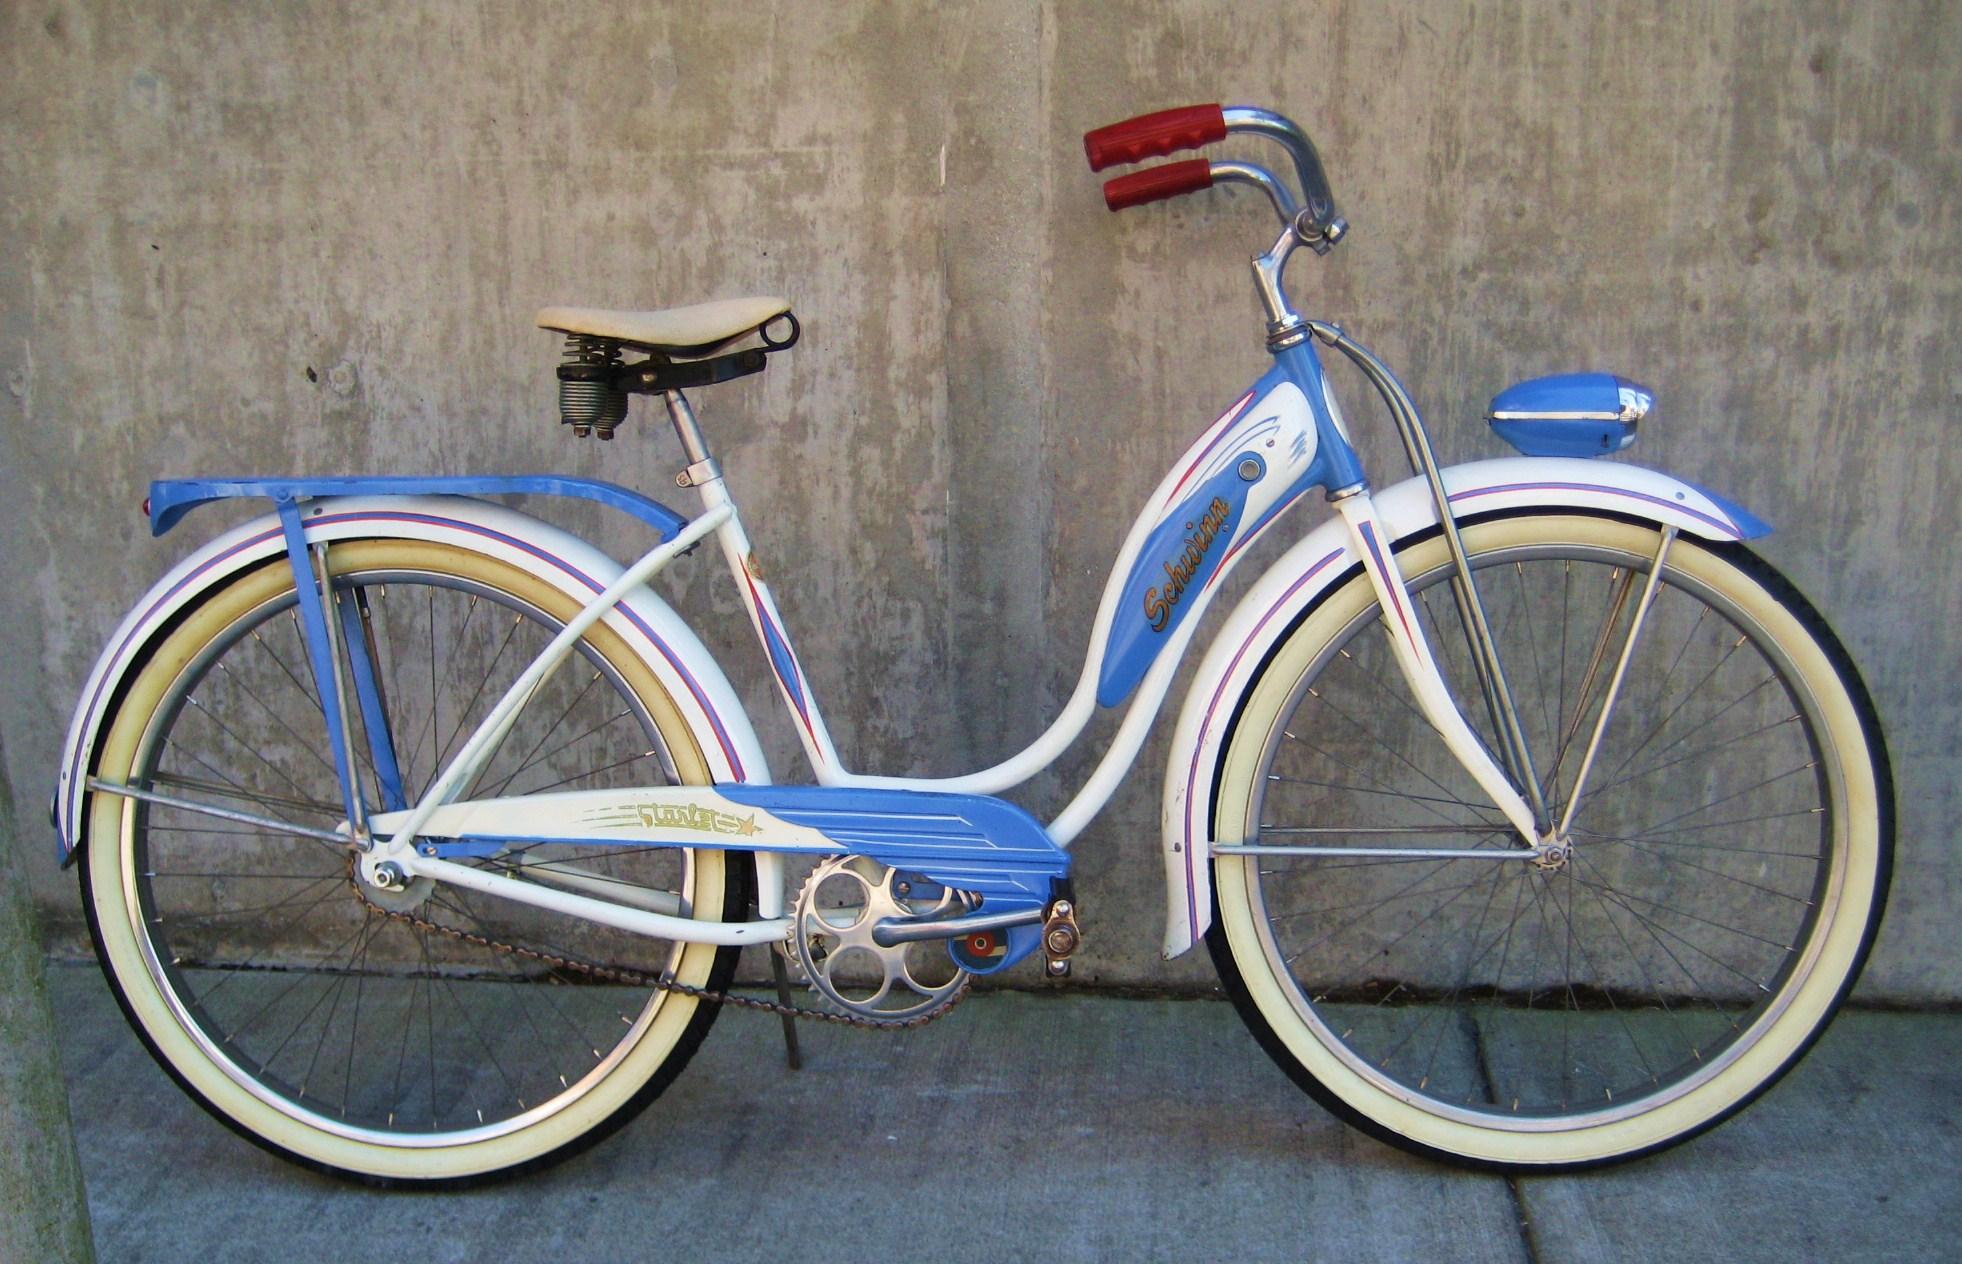 1955 B F Goodrich Schwinn Starlet Bicycle Classic Cycle